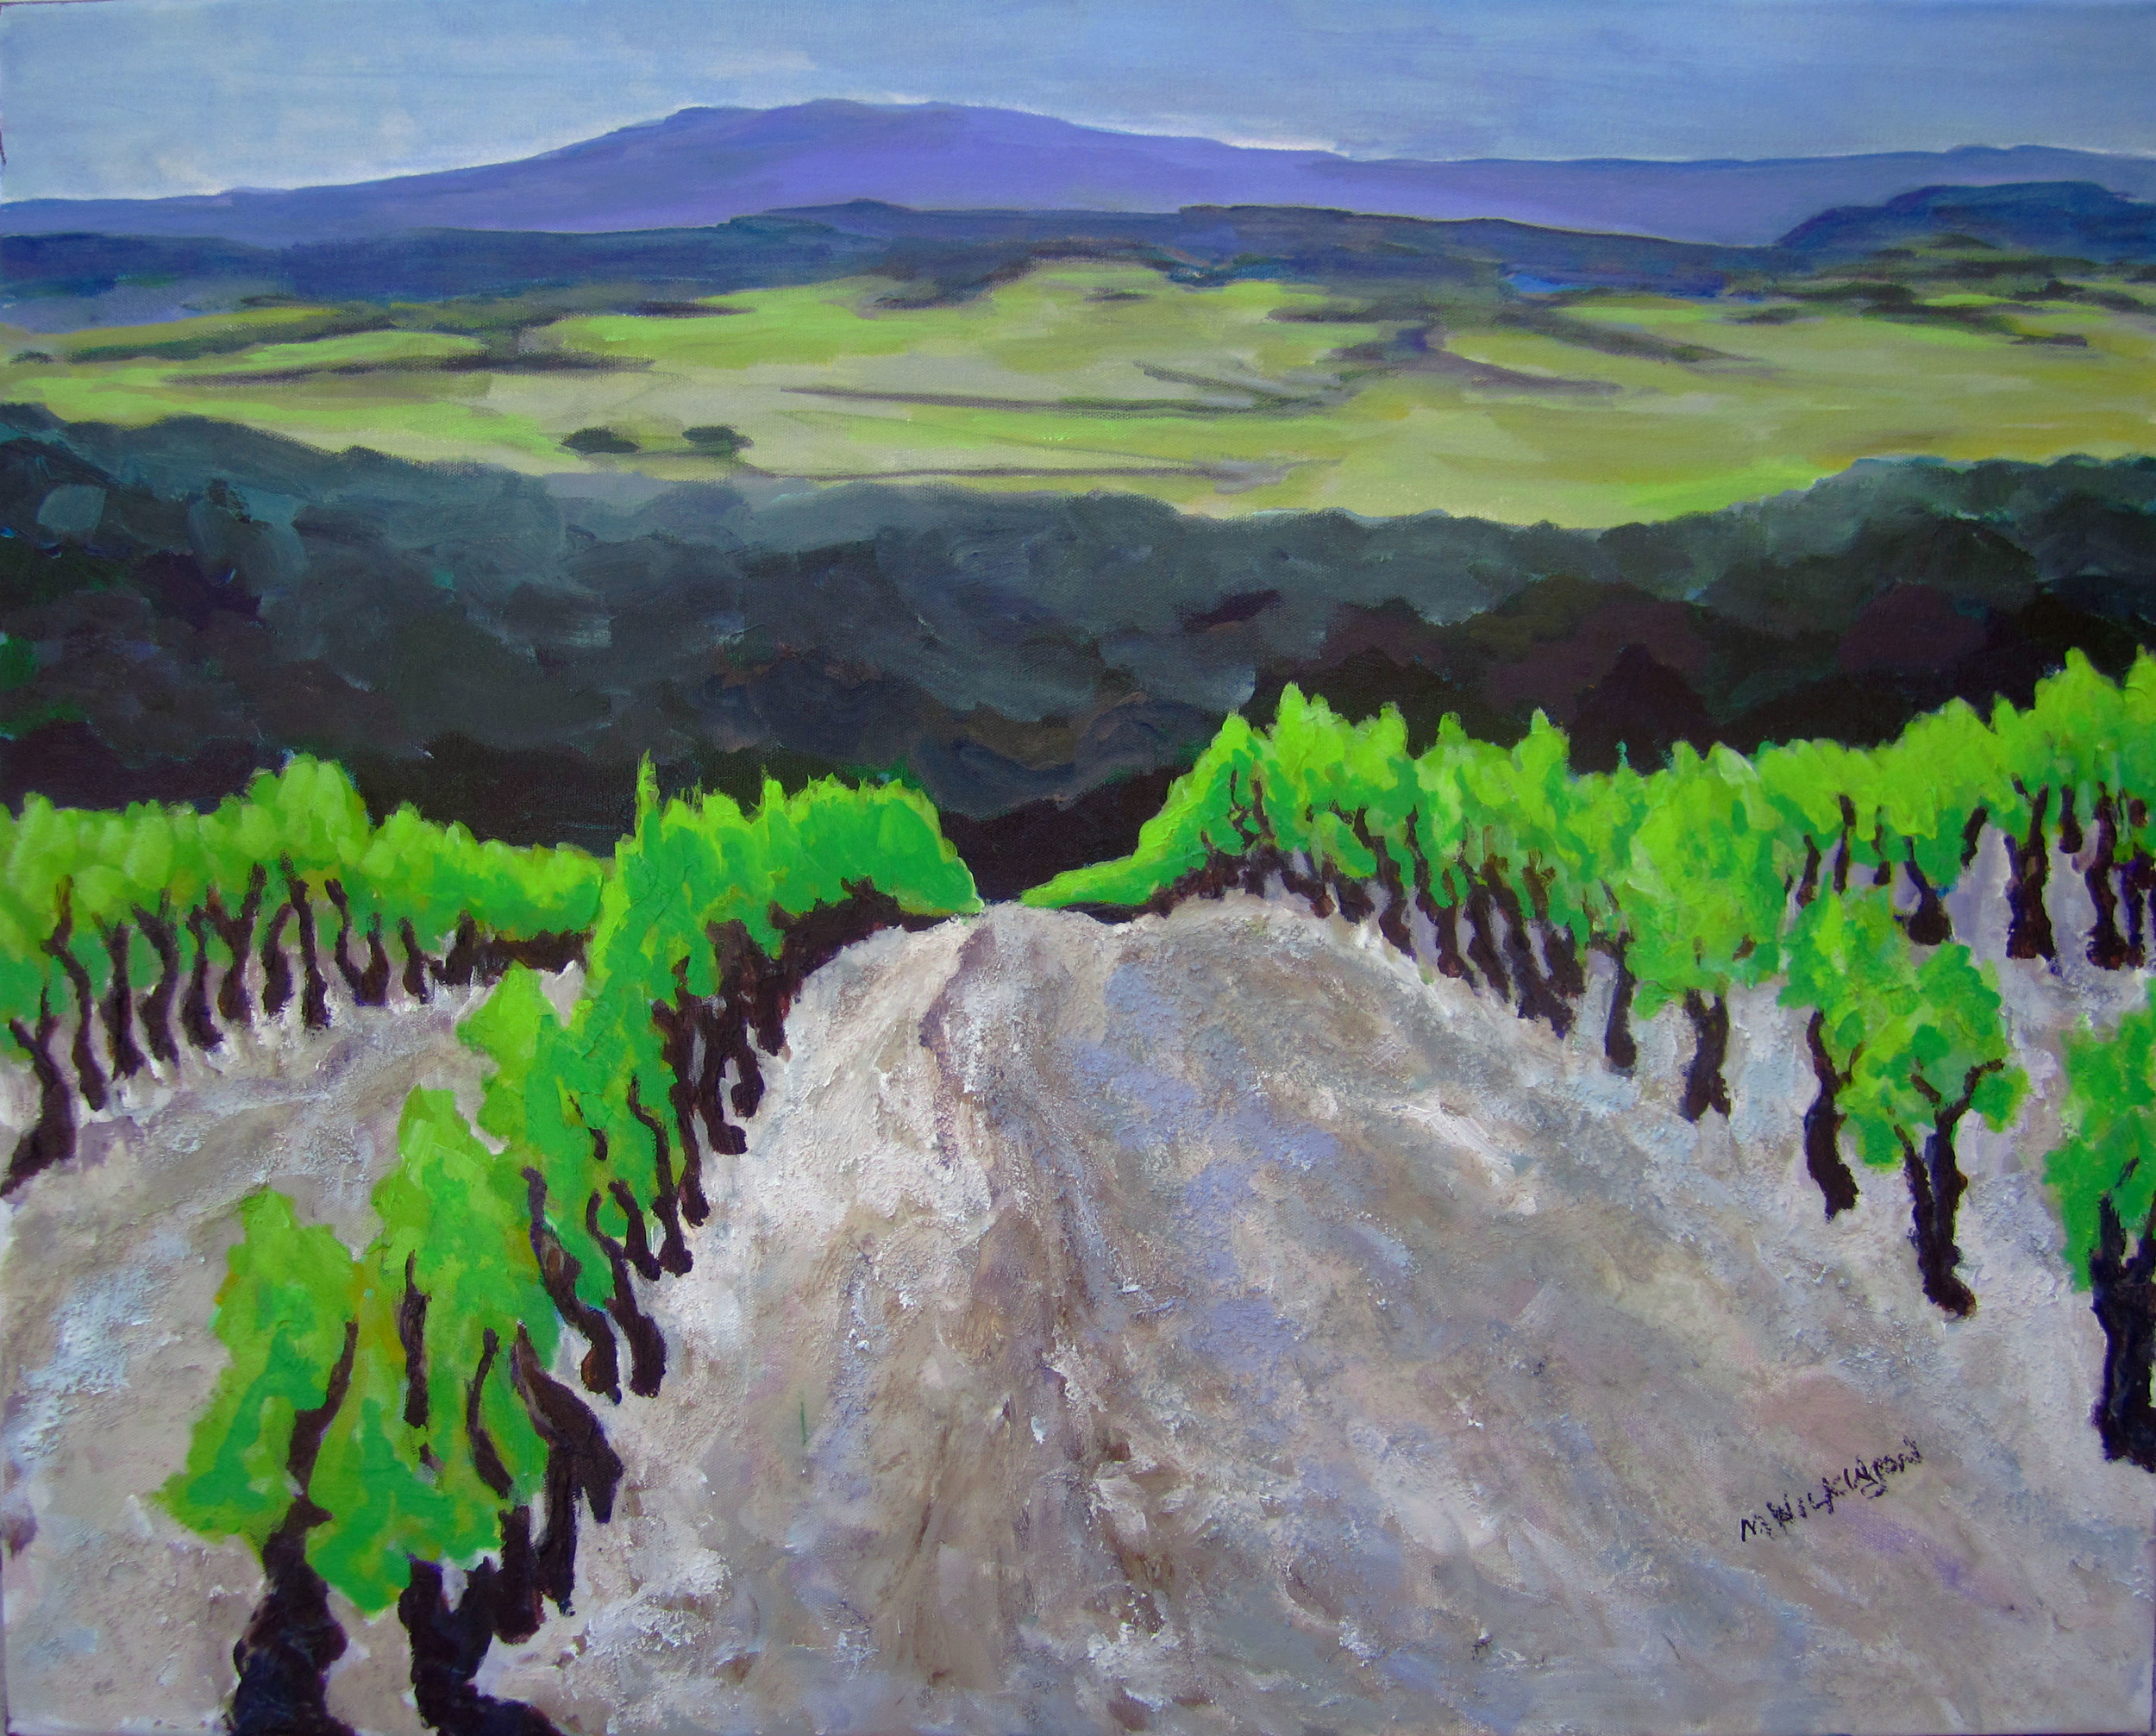 vines of luberon